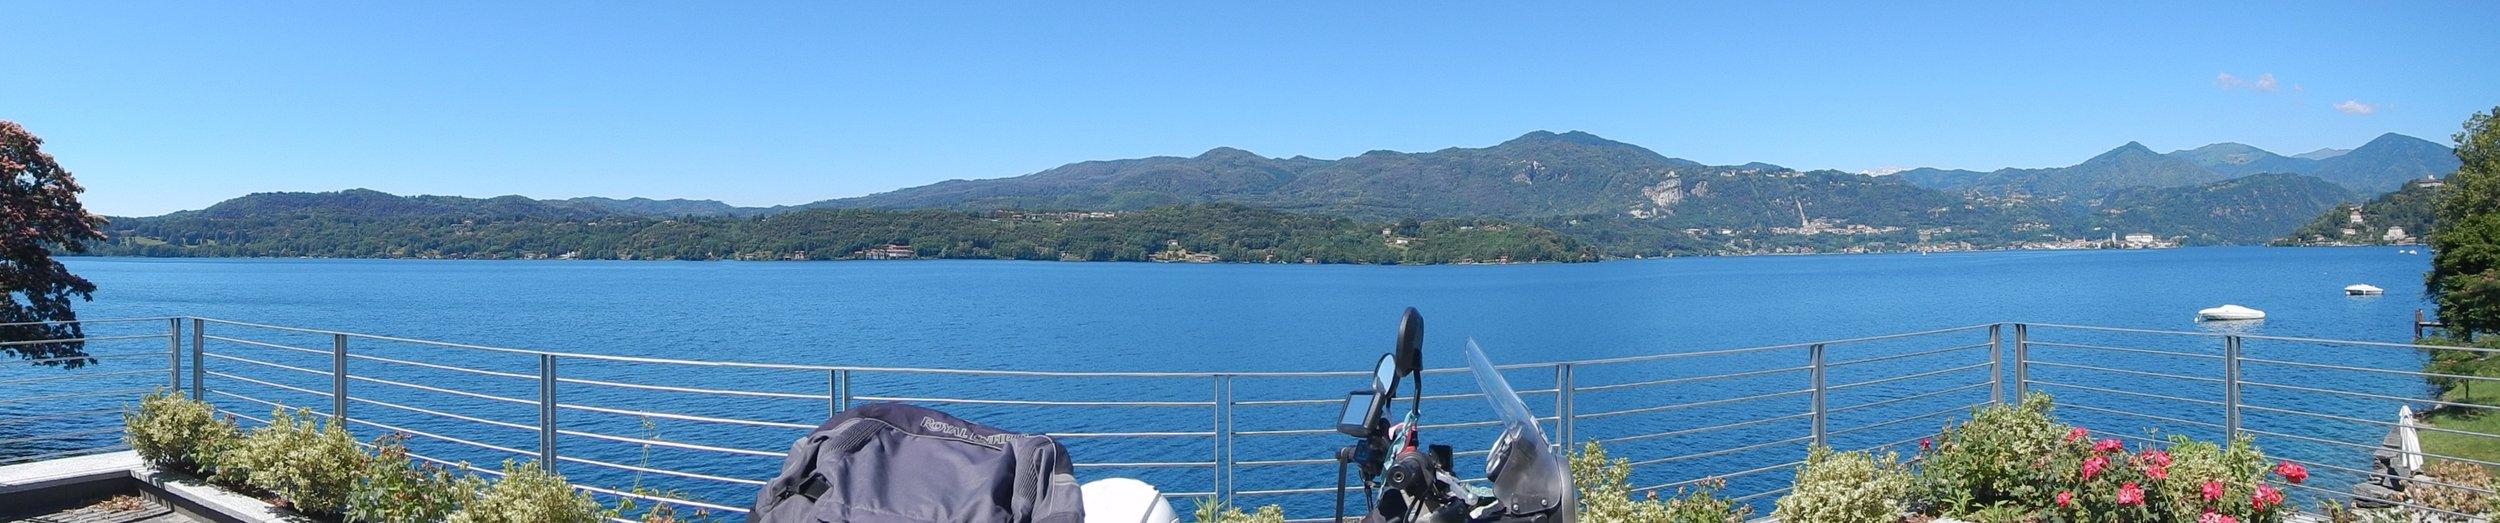 pano of Lago d'orta